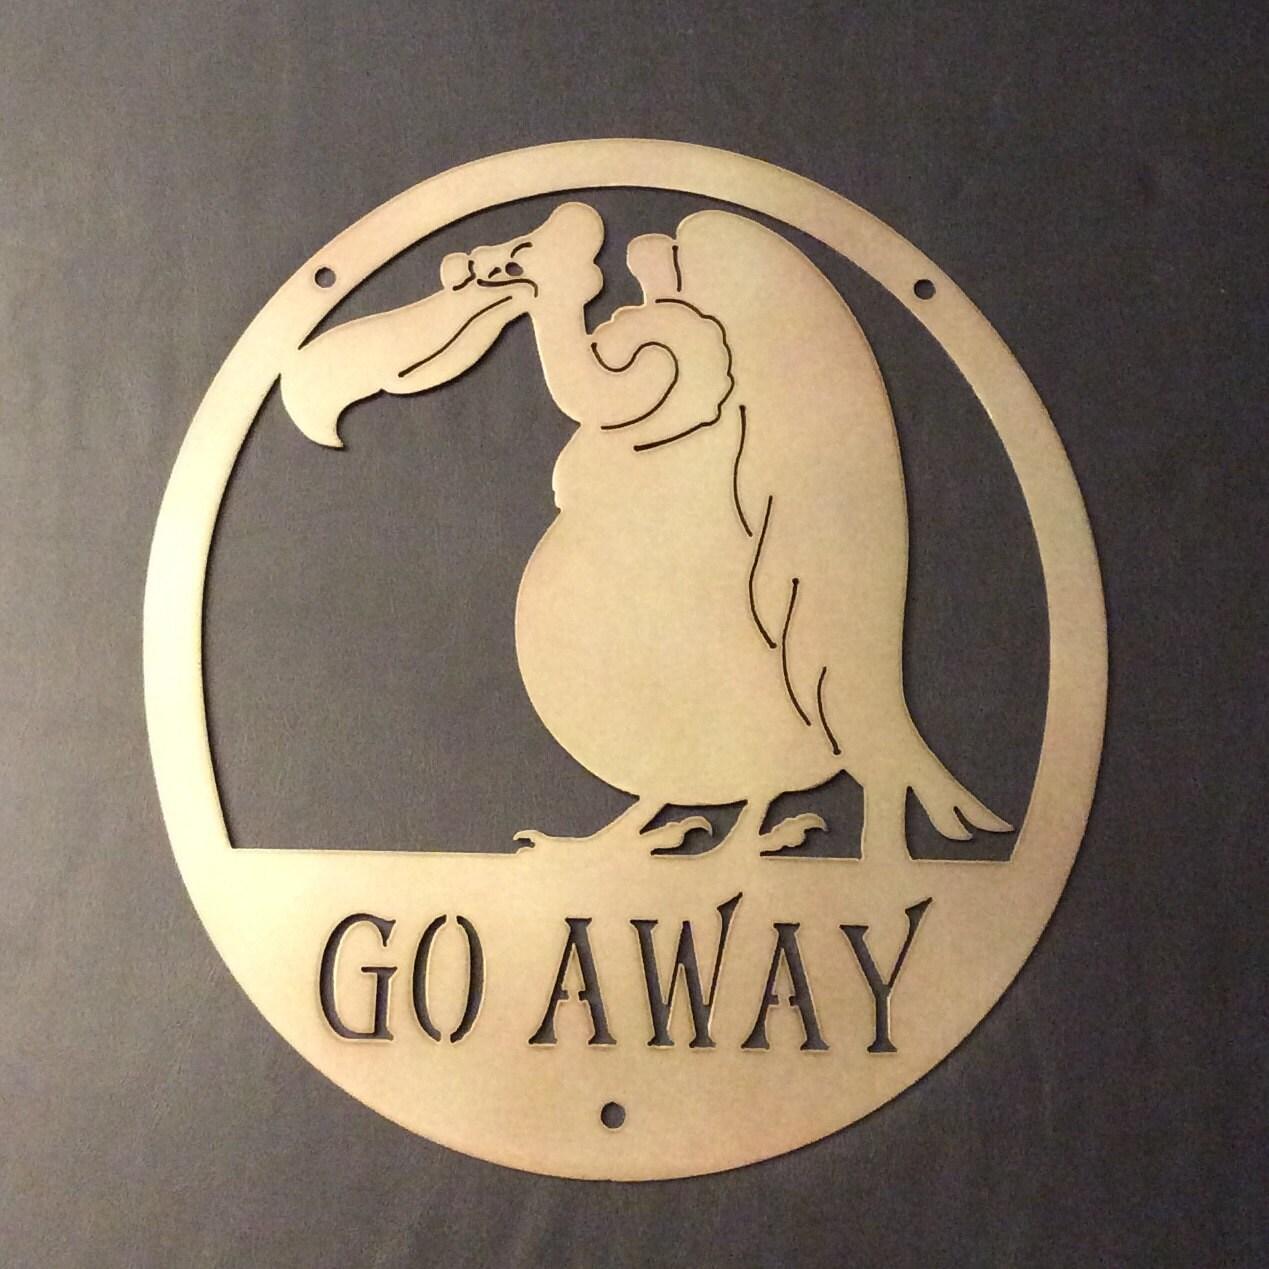 Plasma Cut Vulture GO AWAY Gag Welcome Sign Metal Wall Art | Etsy